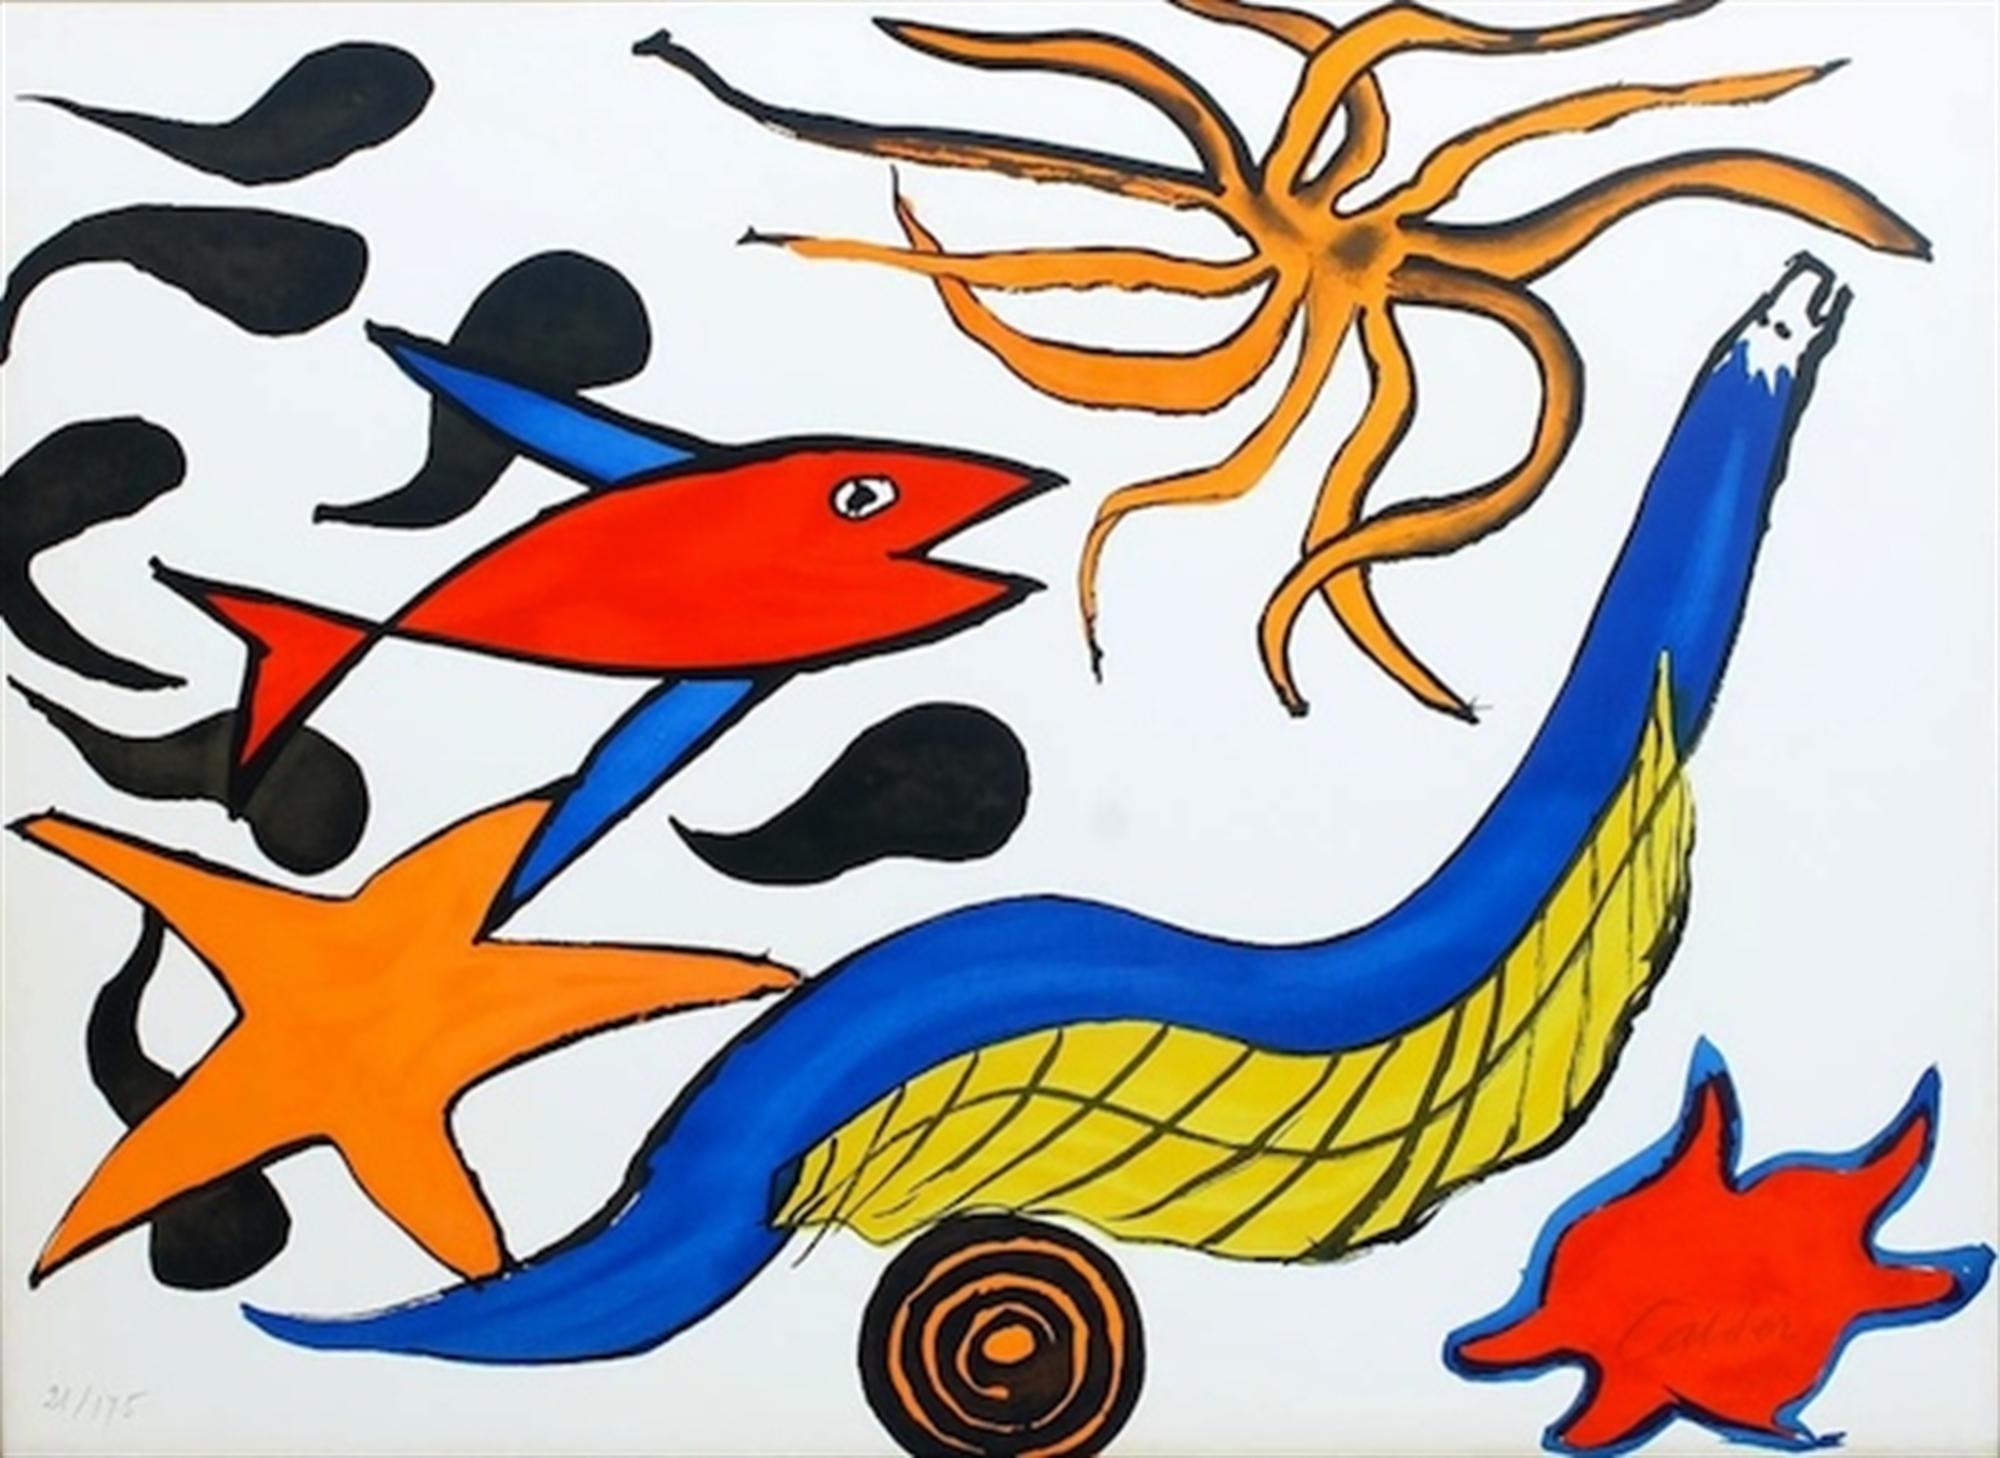 Sea Creatures - Star by Alexander Calder